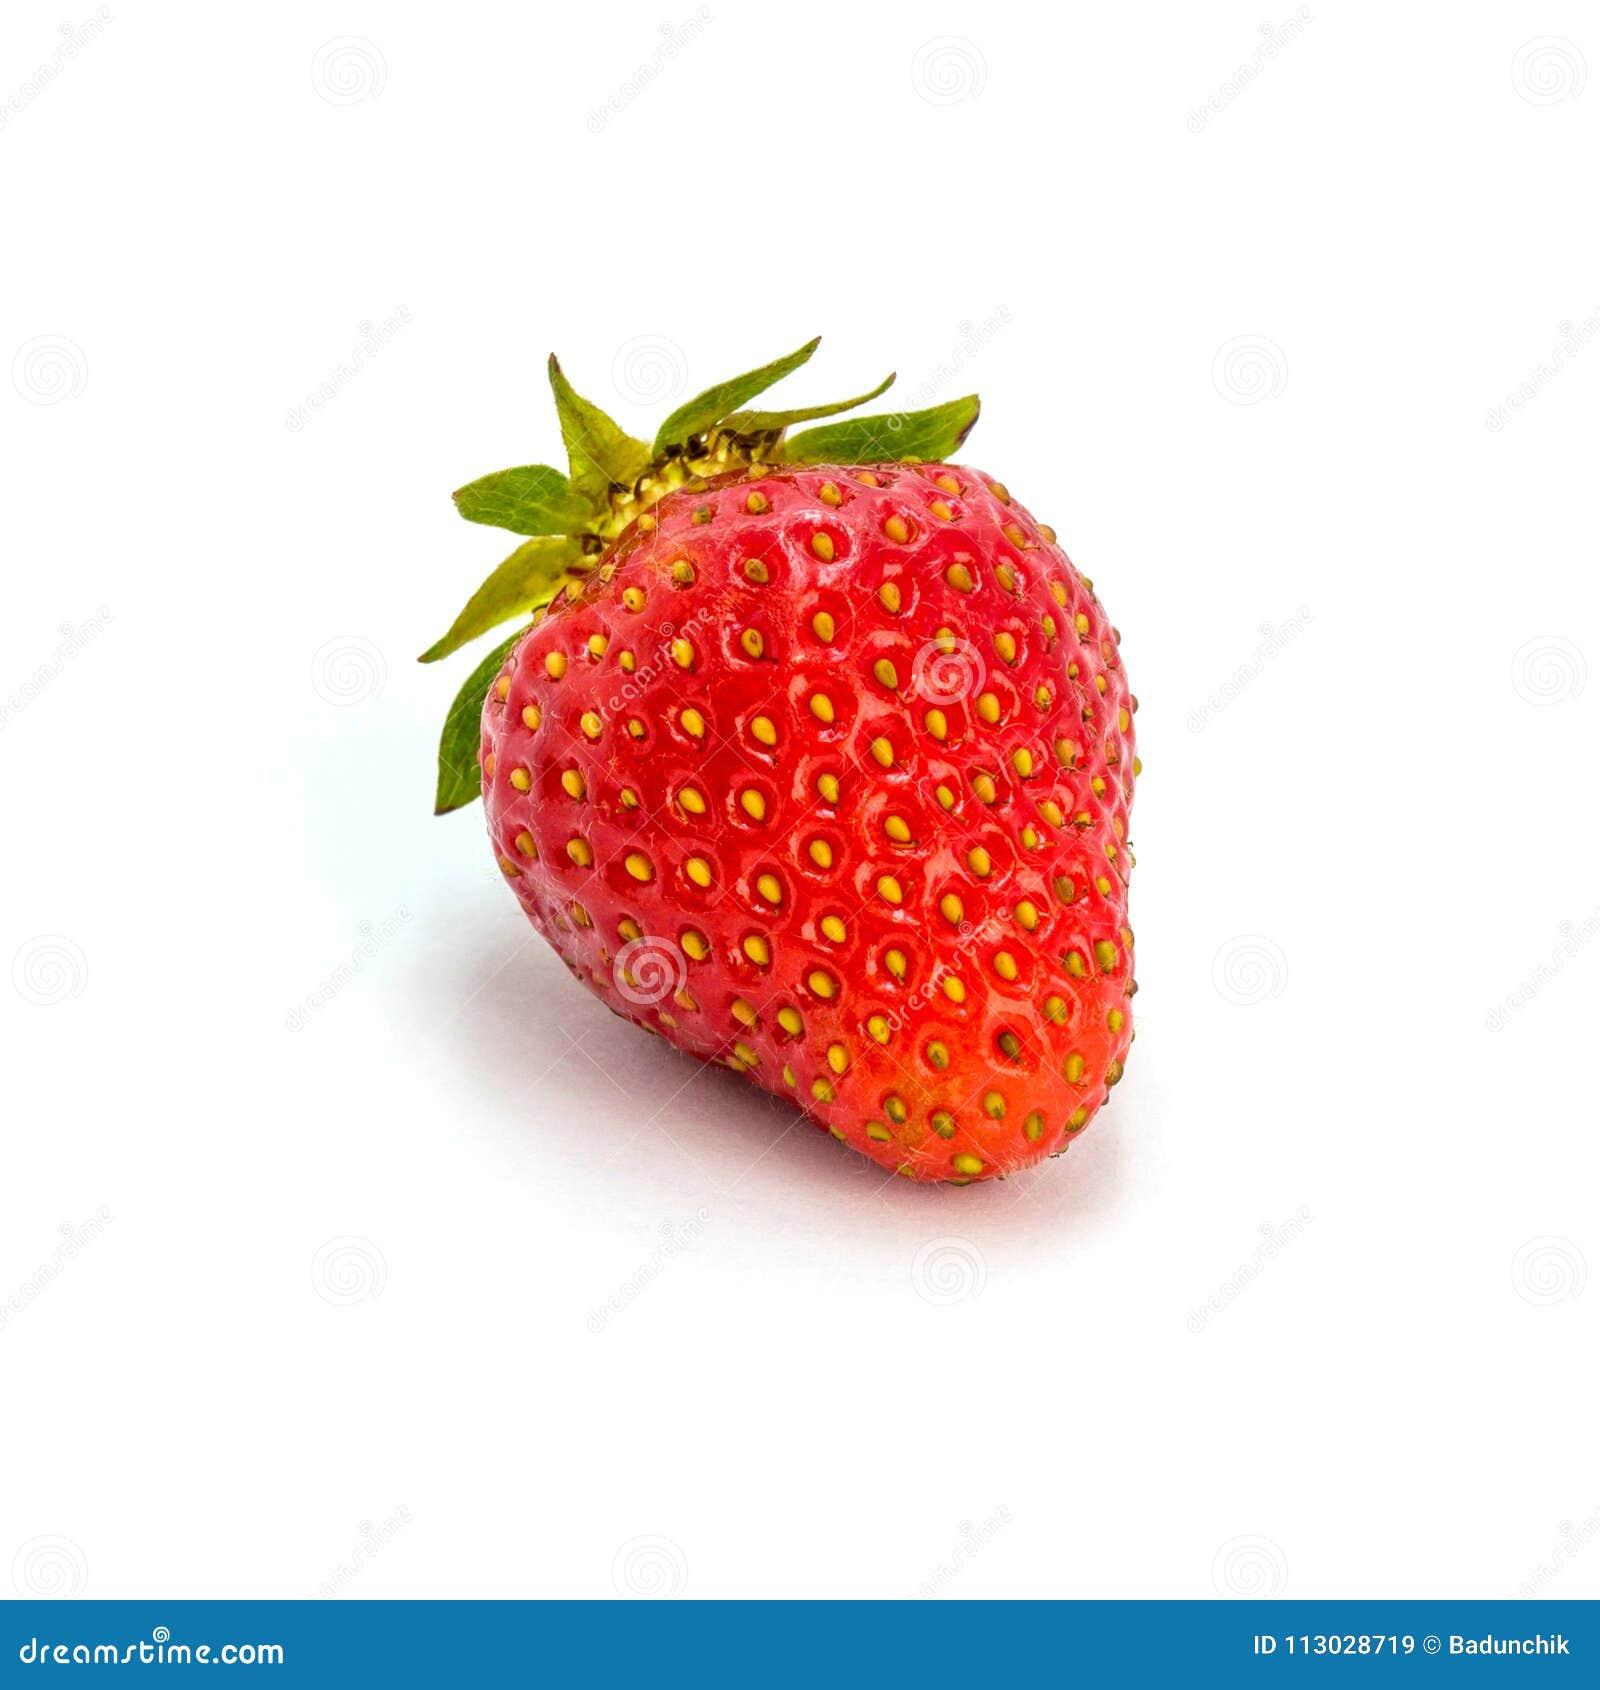 Foto de la fresa roja aislada en el fondo blanco